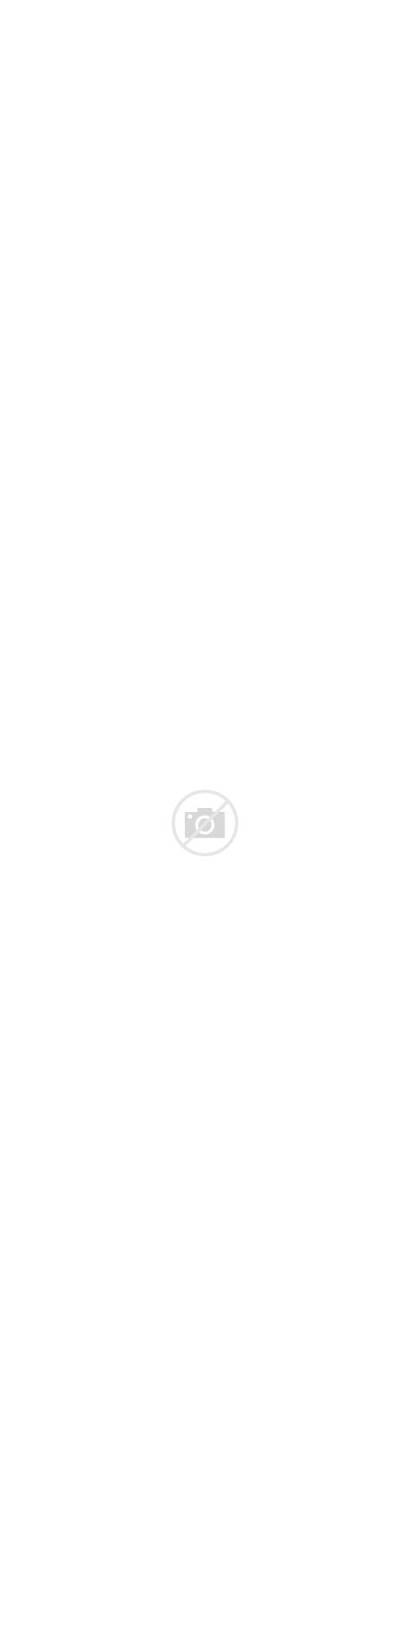 Pinot Grigio Earth Rare Organic Bottle Winery